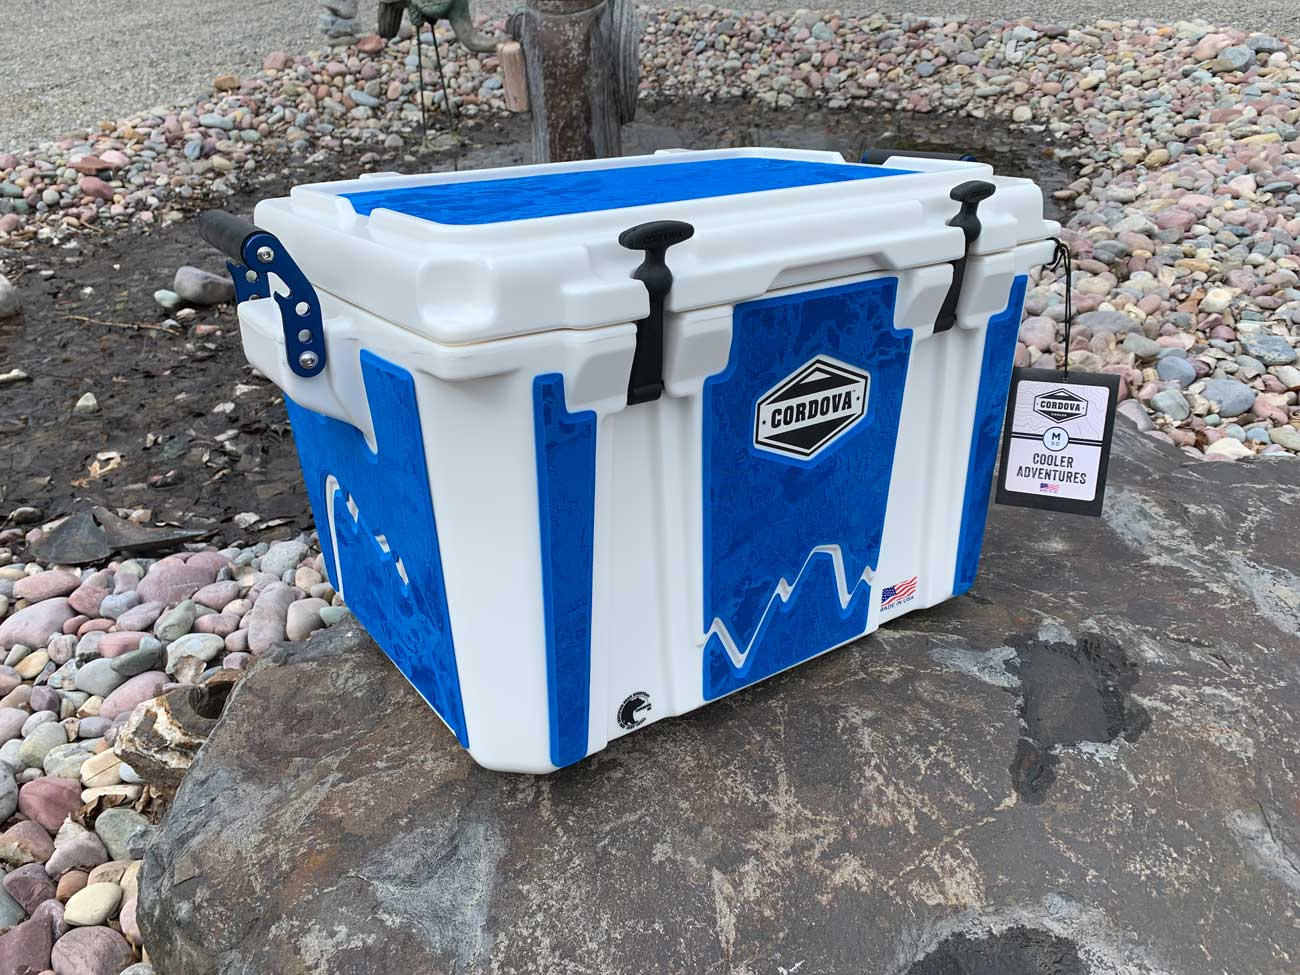 White Cordova cooler with blue custom seadek pads